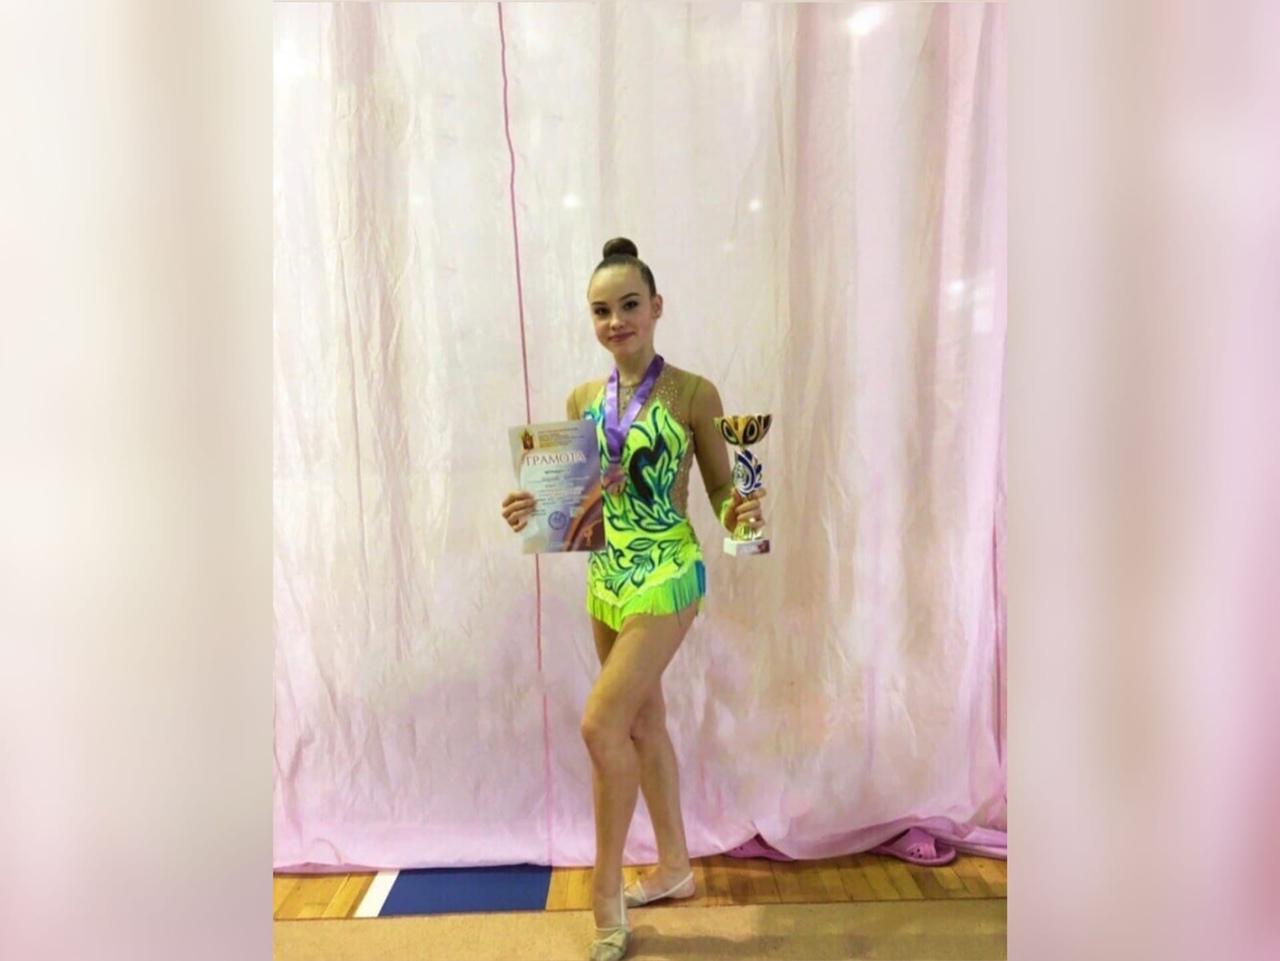 Девушка дня — юная студентка Екатерина Жаркова!